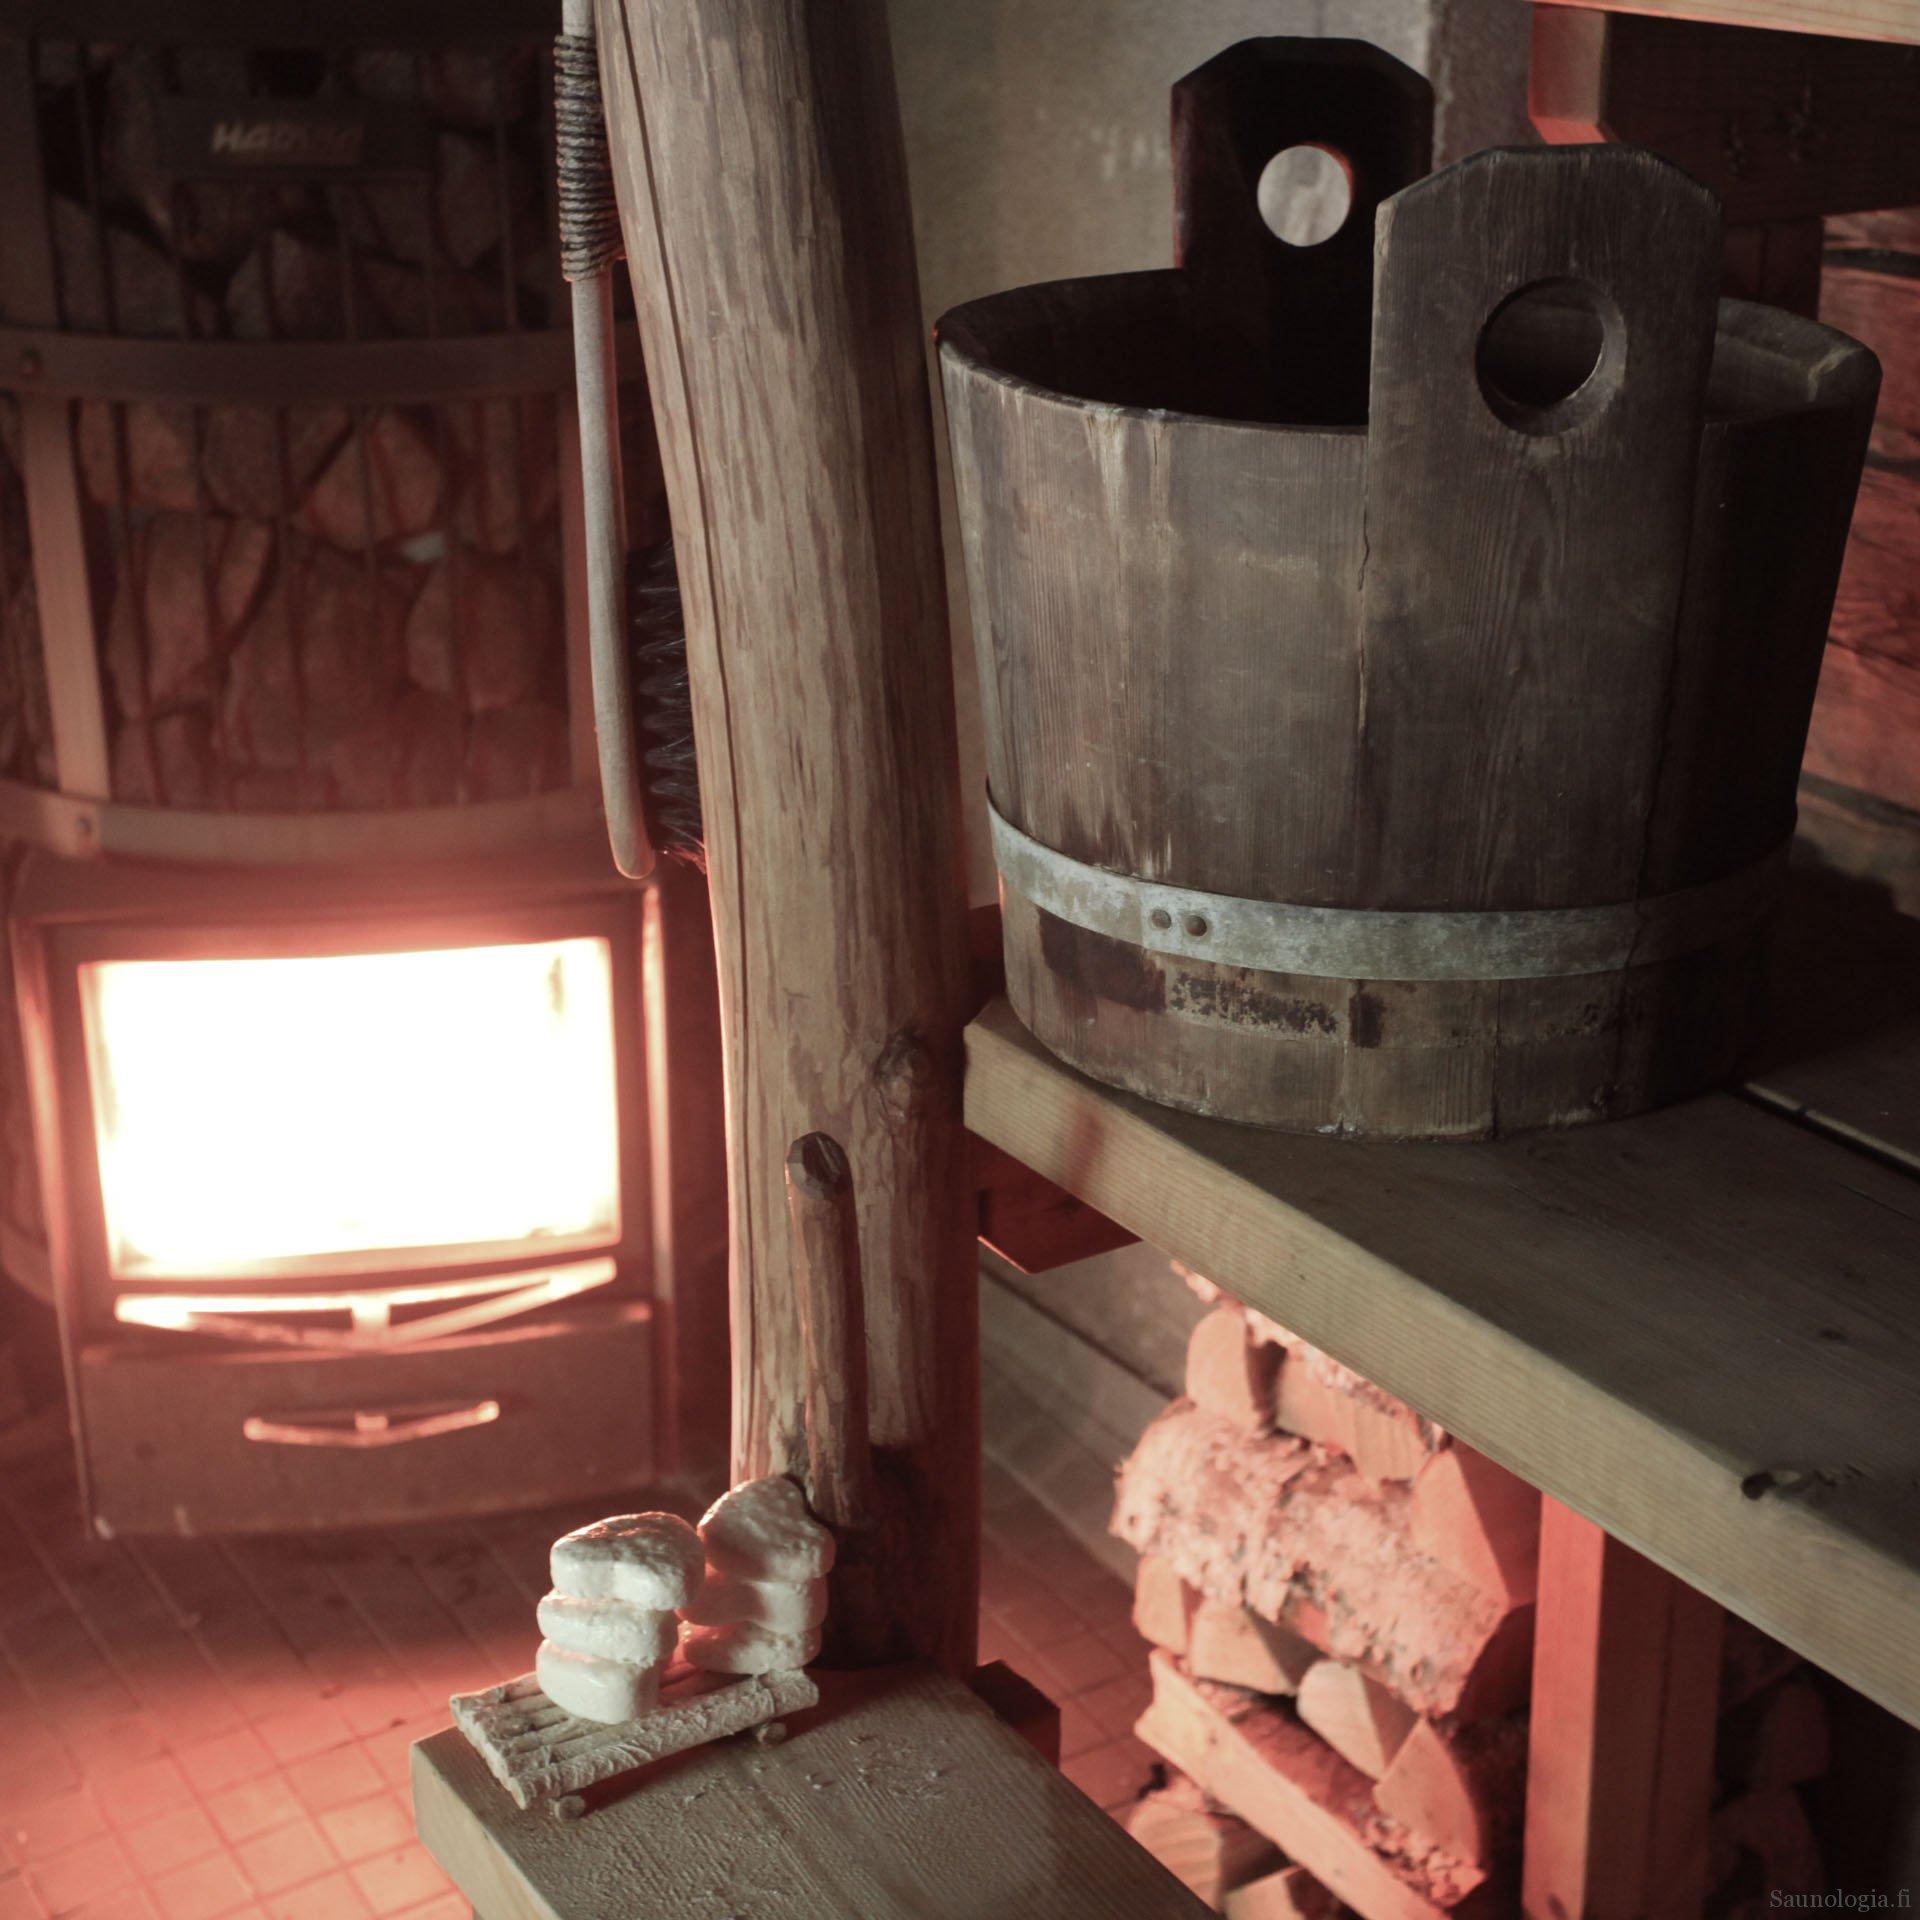 171013-kaurila-sauna-peseytymisvalineet